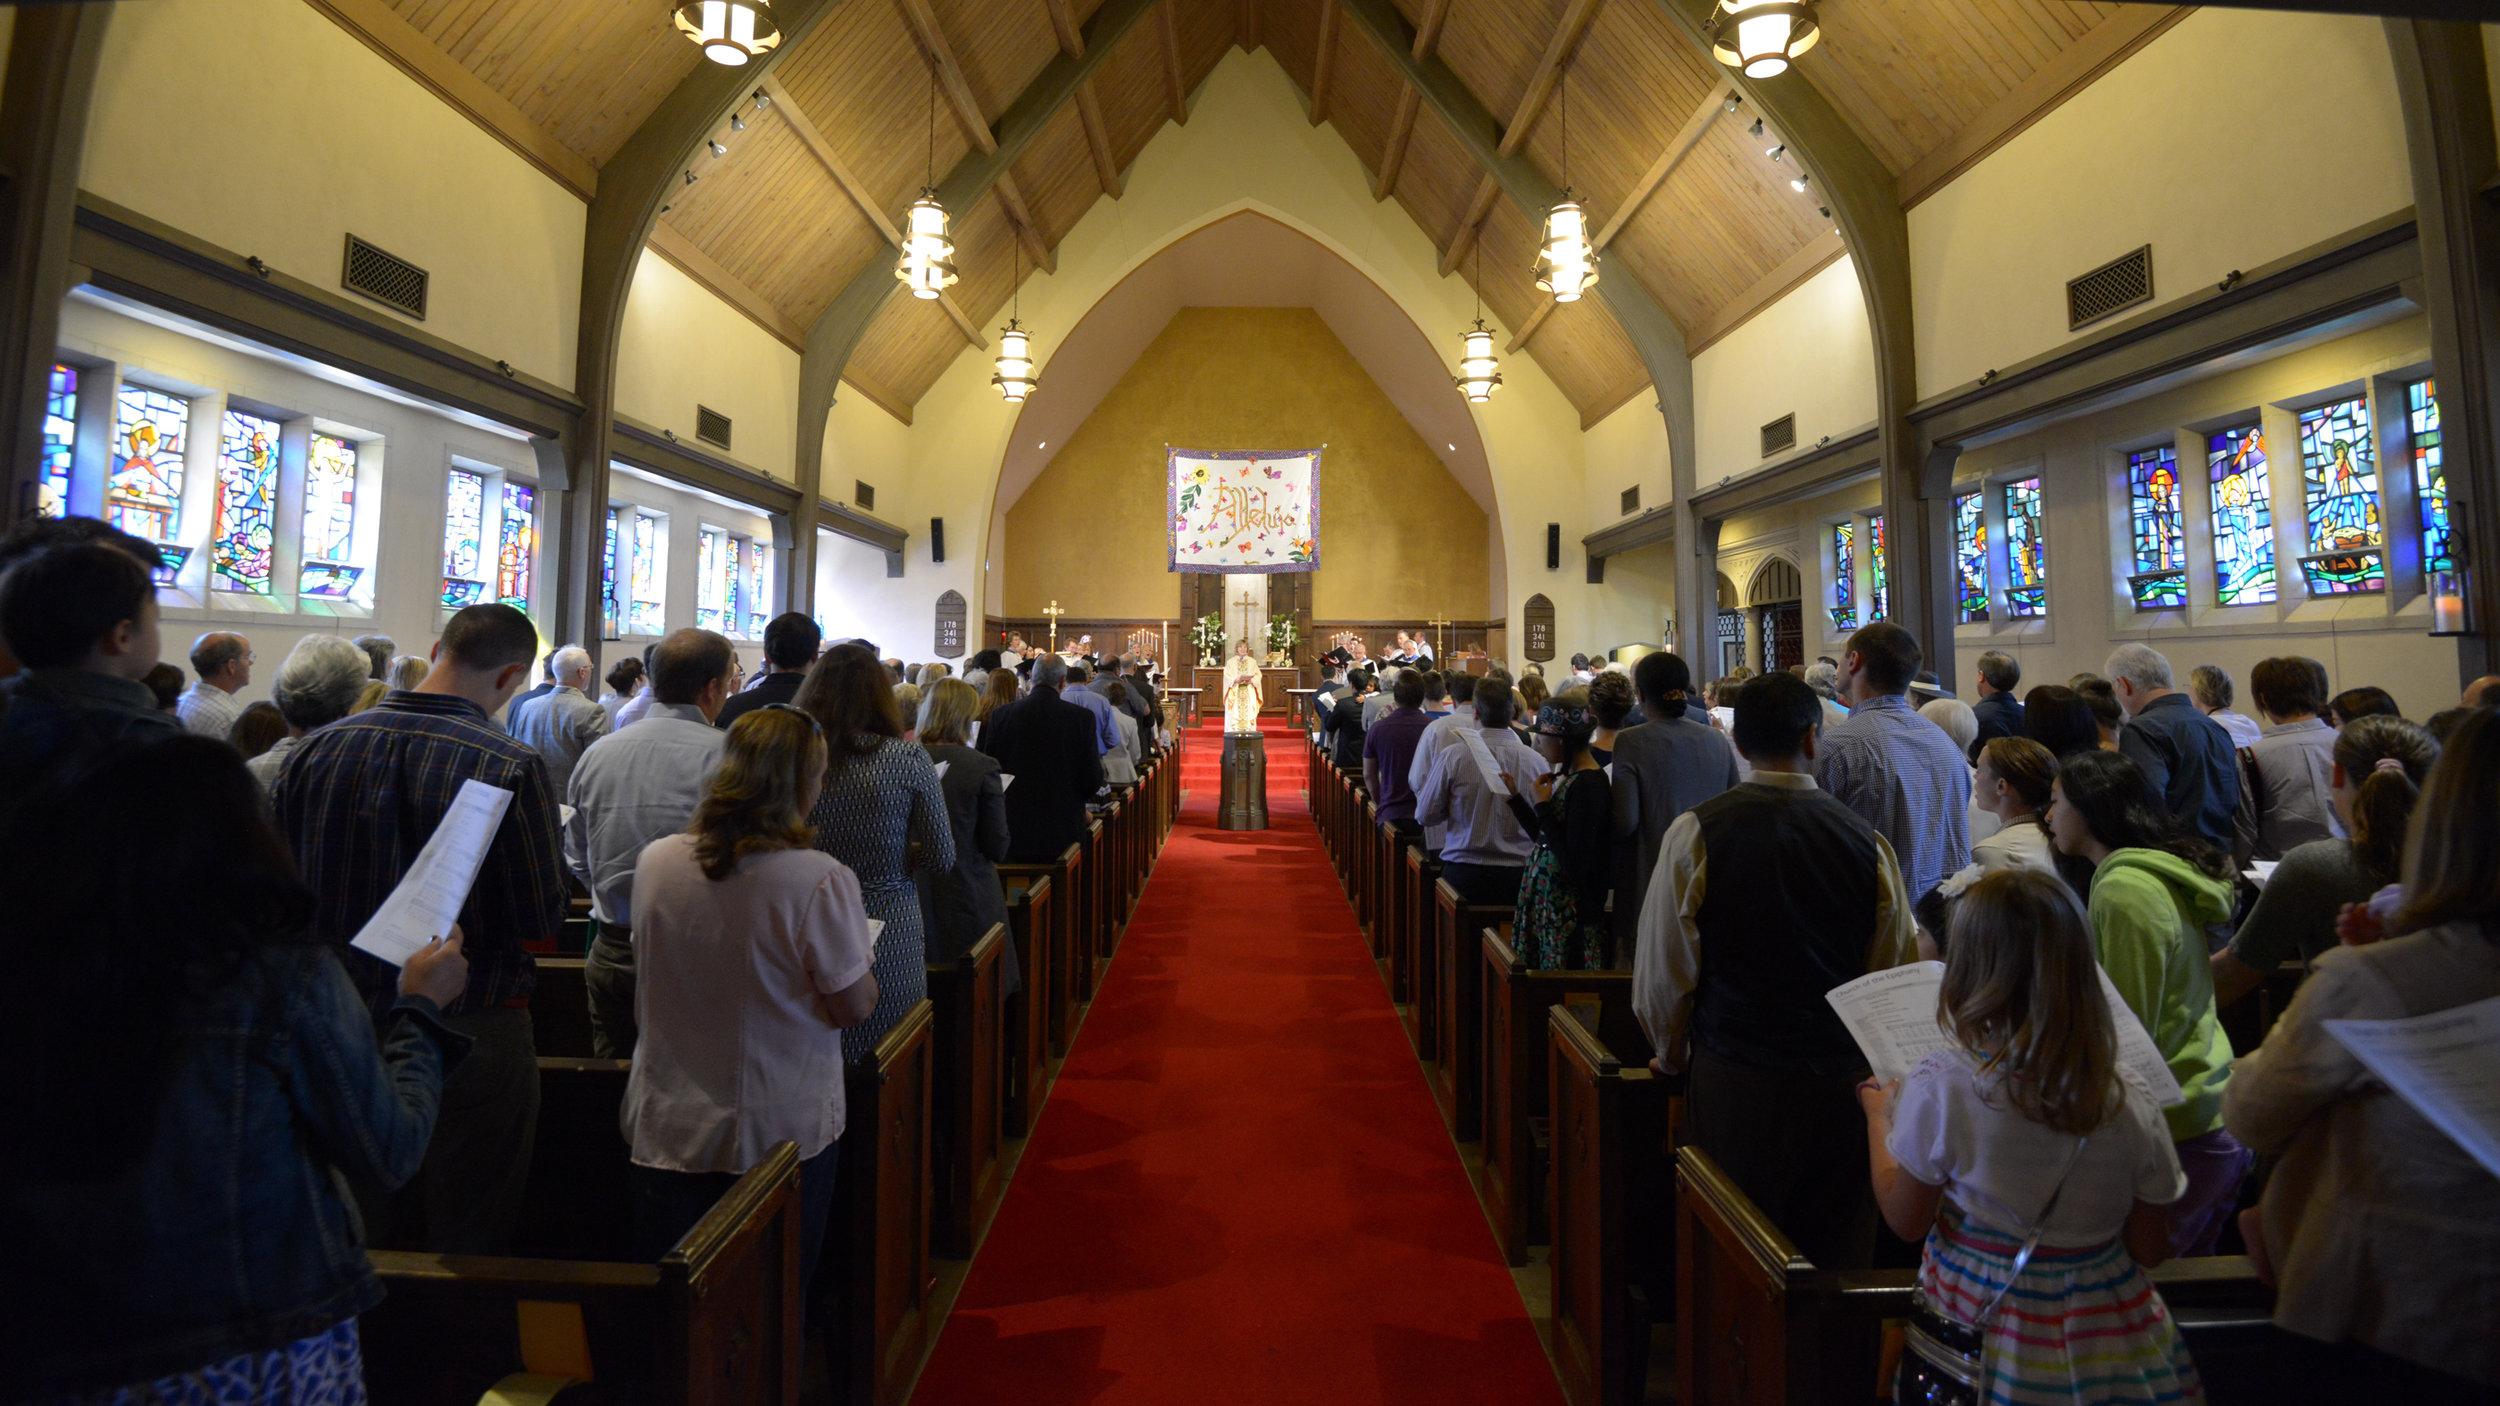 Facing the Altar